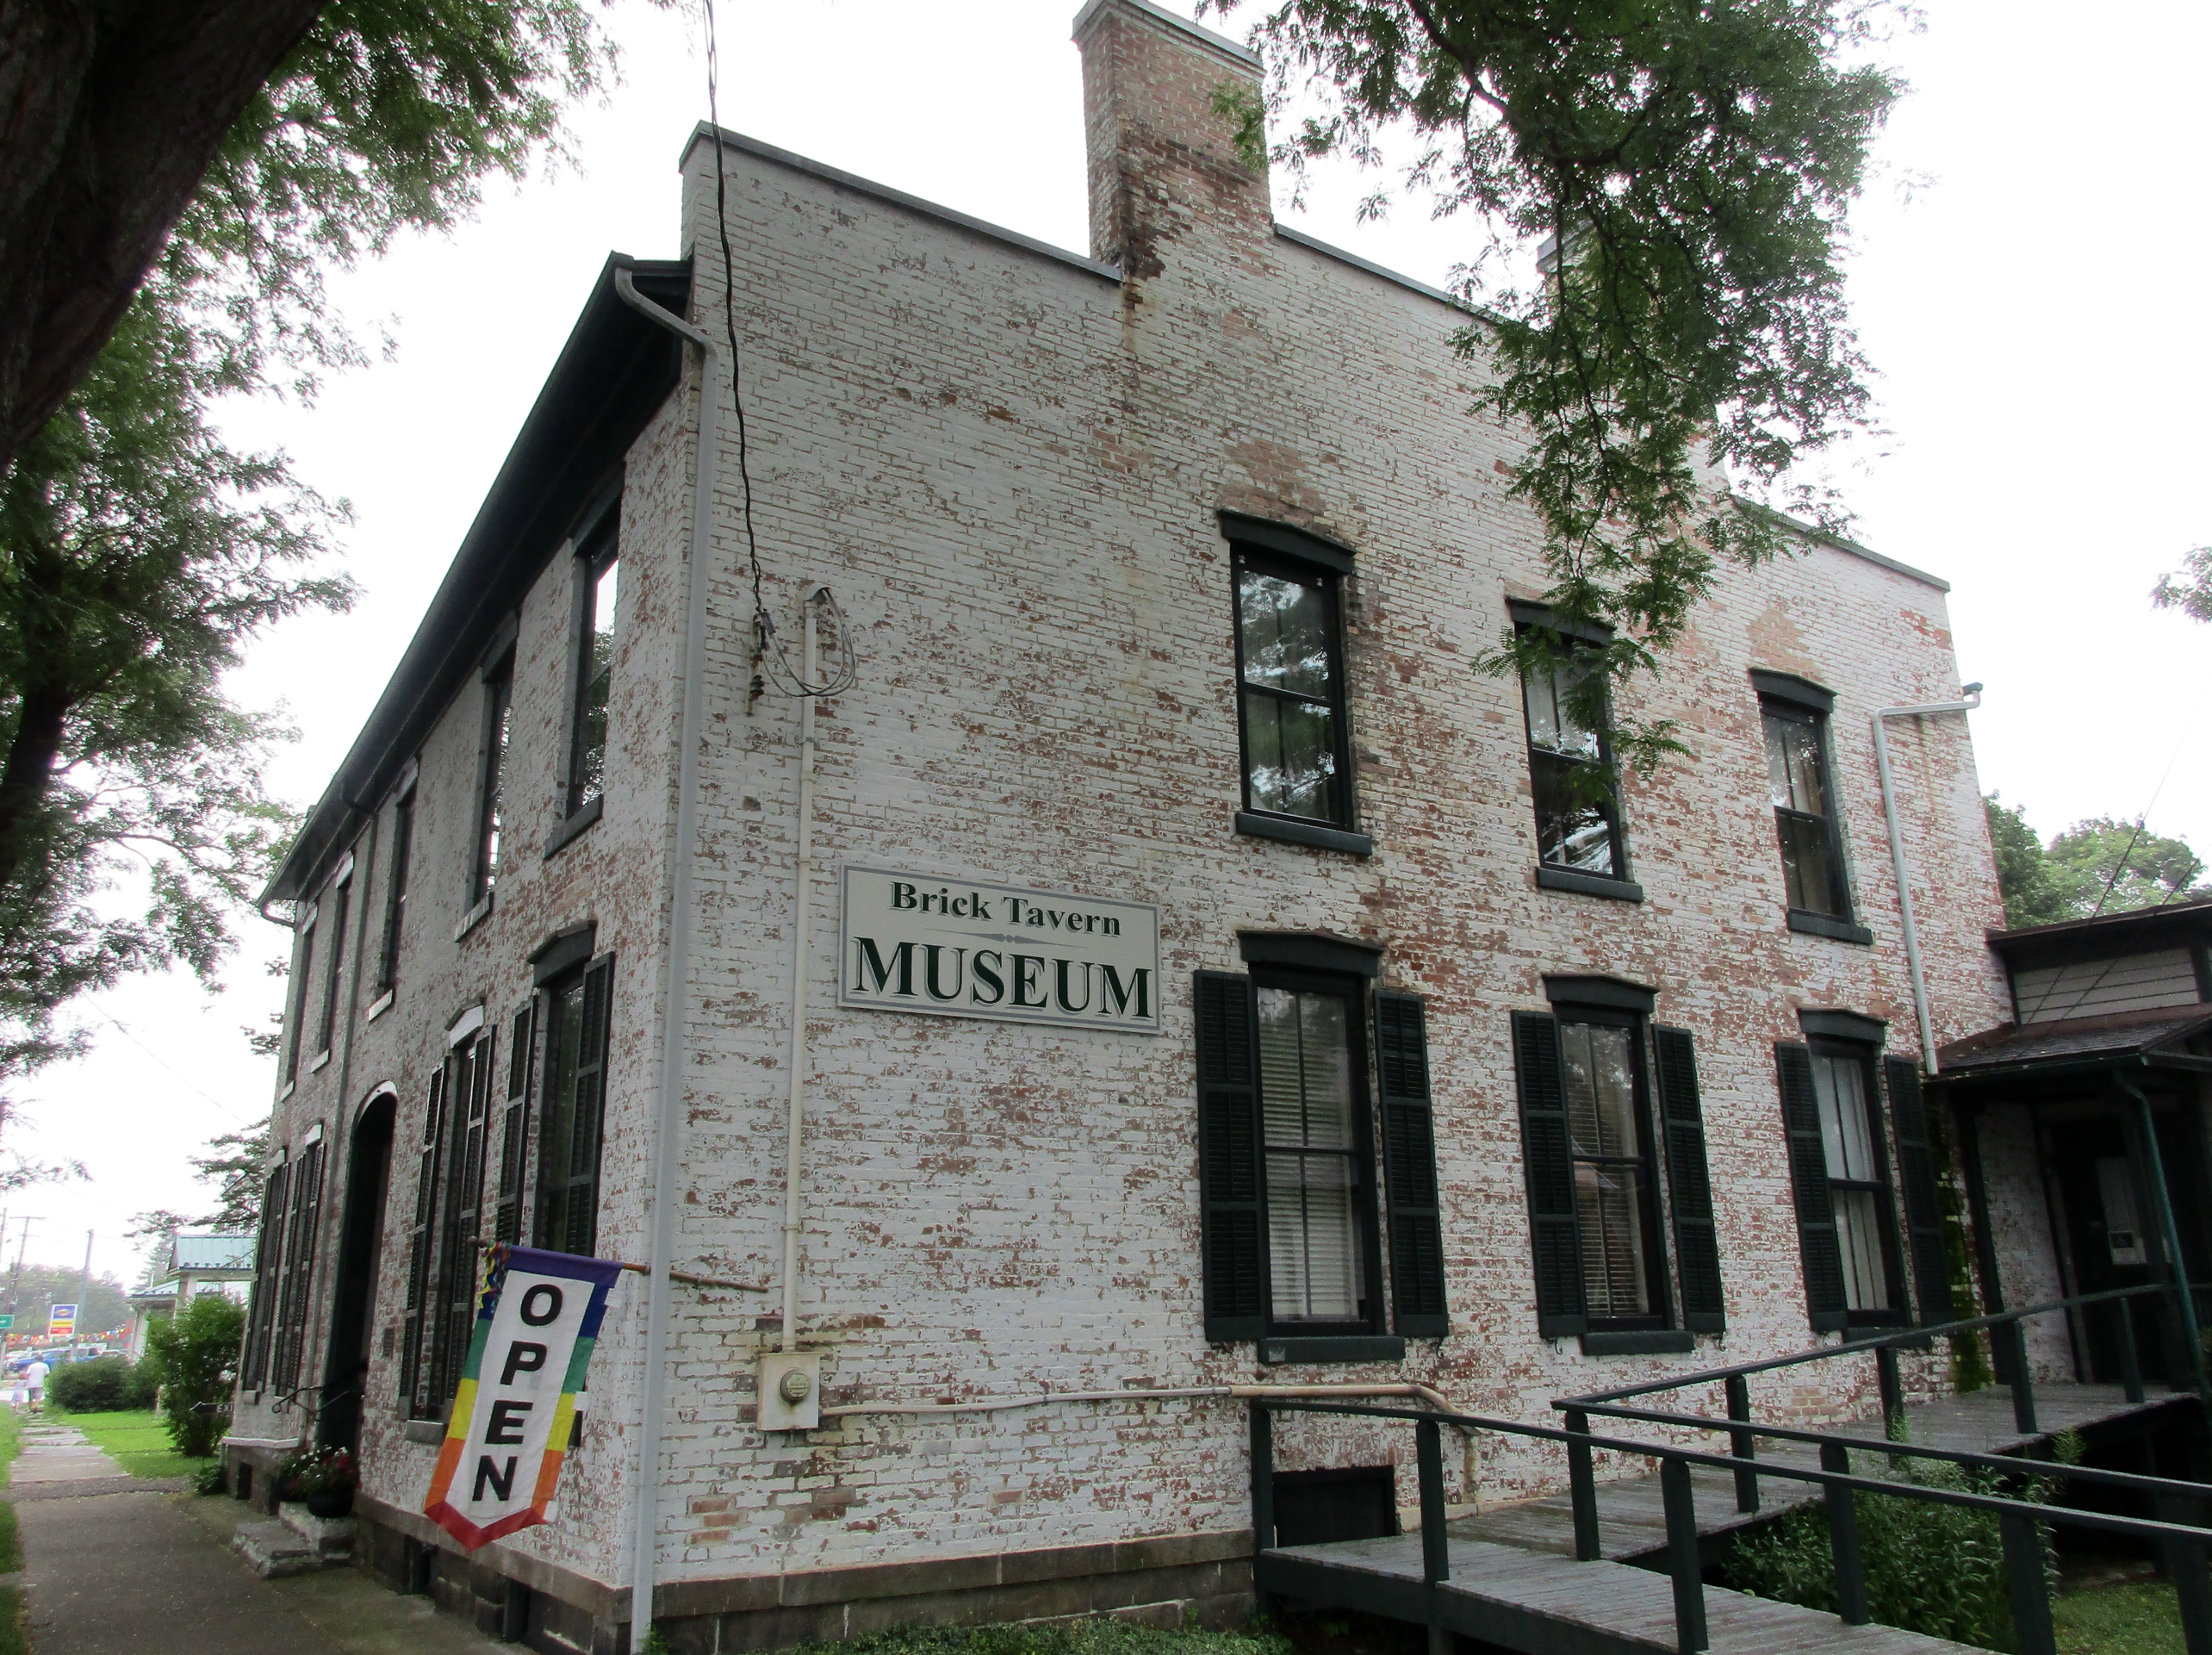 Brick Tavern Museum